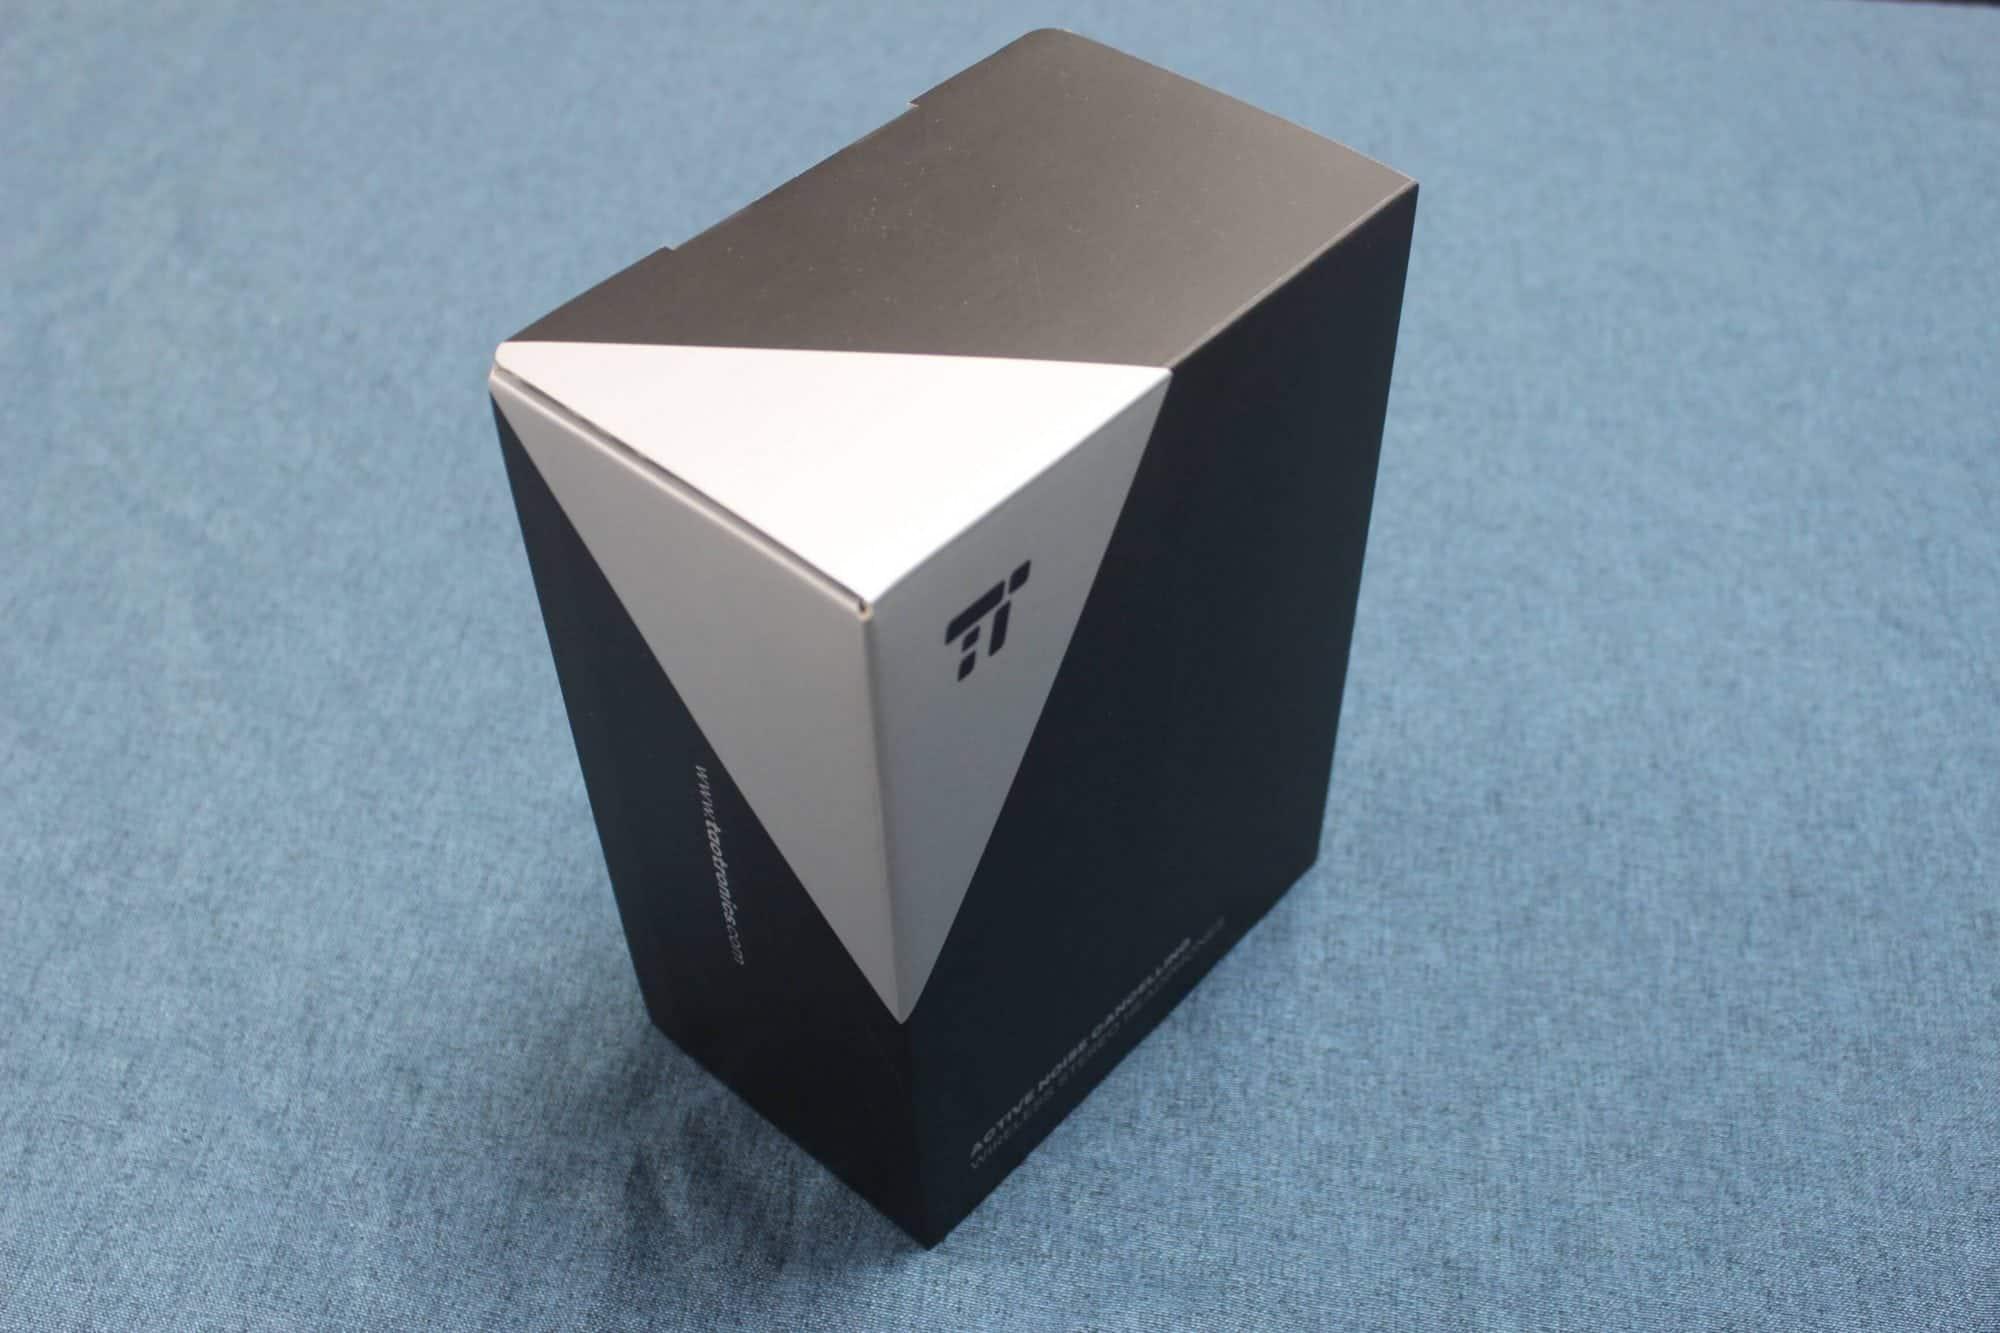 Bose以外的2019年CP值優先 降噪藍芽耳機選擇 ─ TaoTronics TT-BH22-TechTeller (科技說)